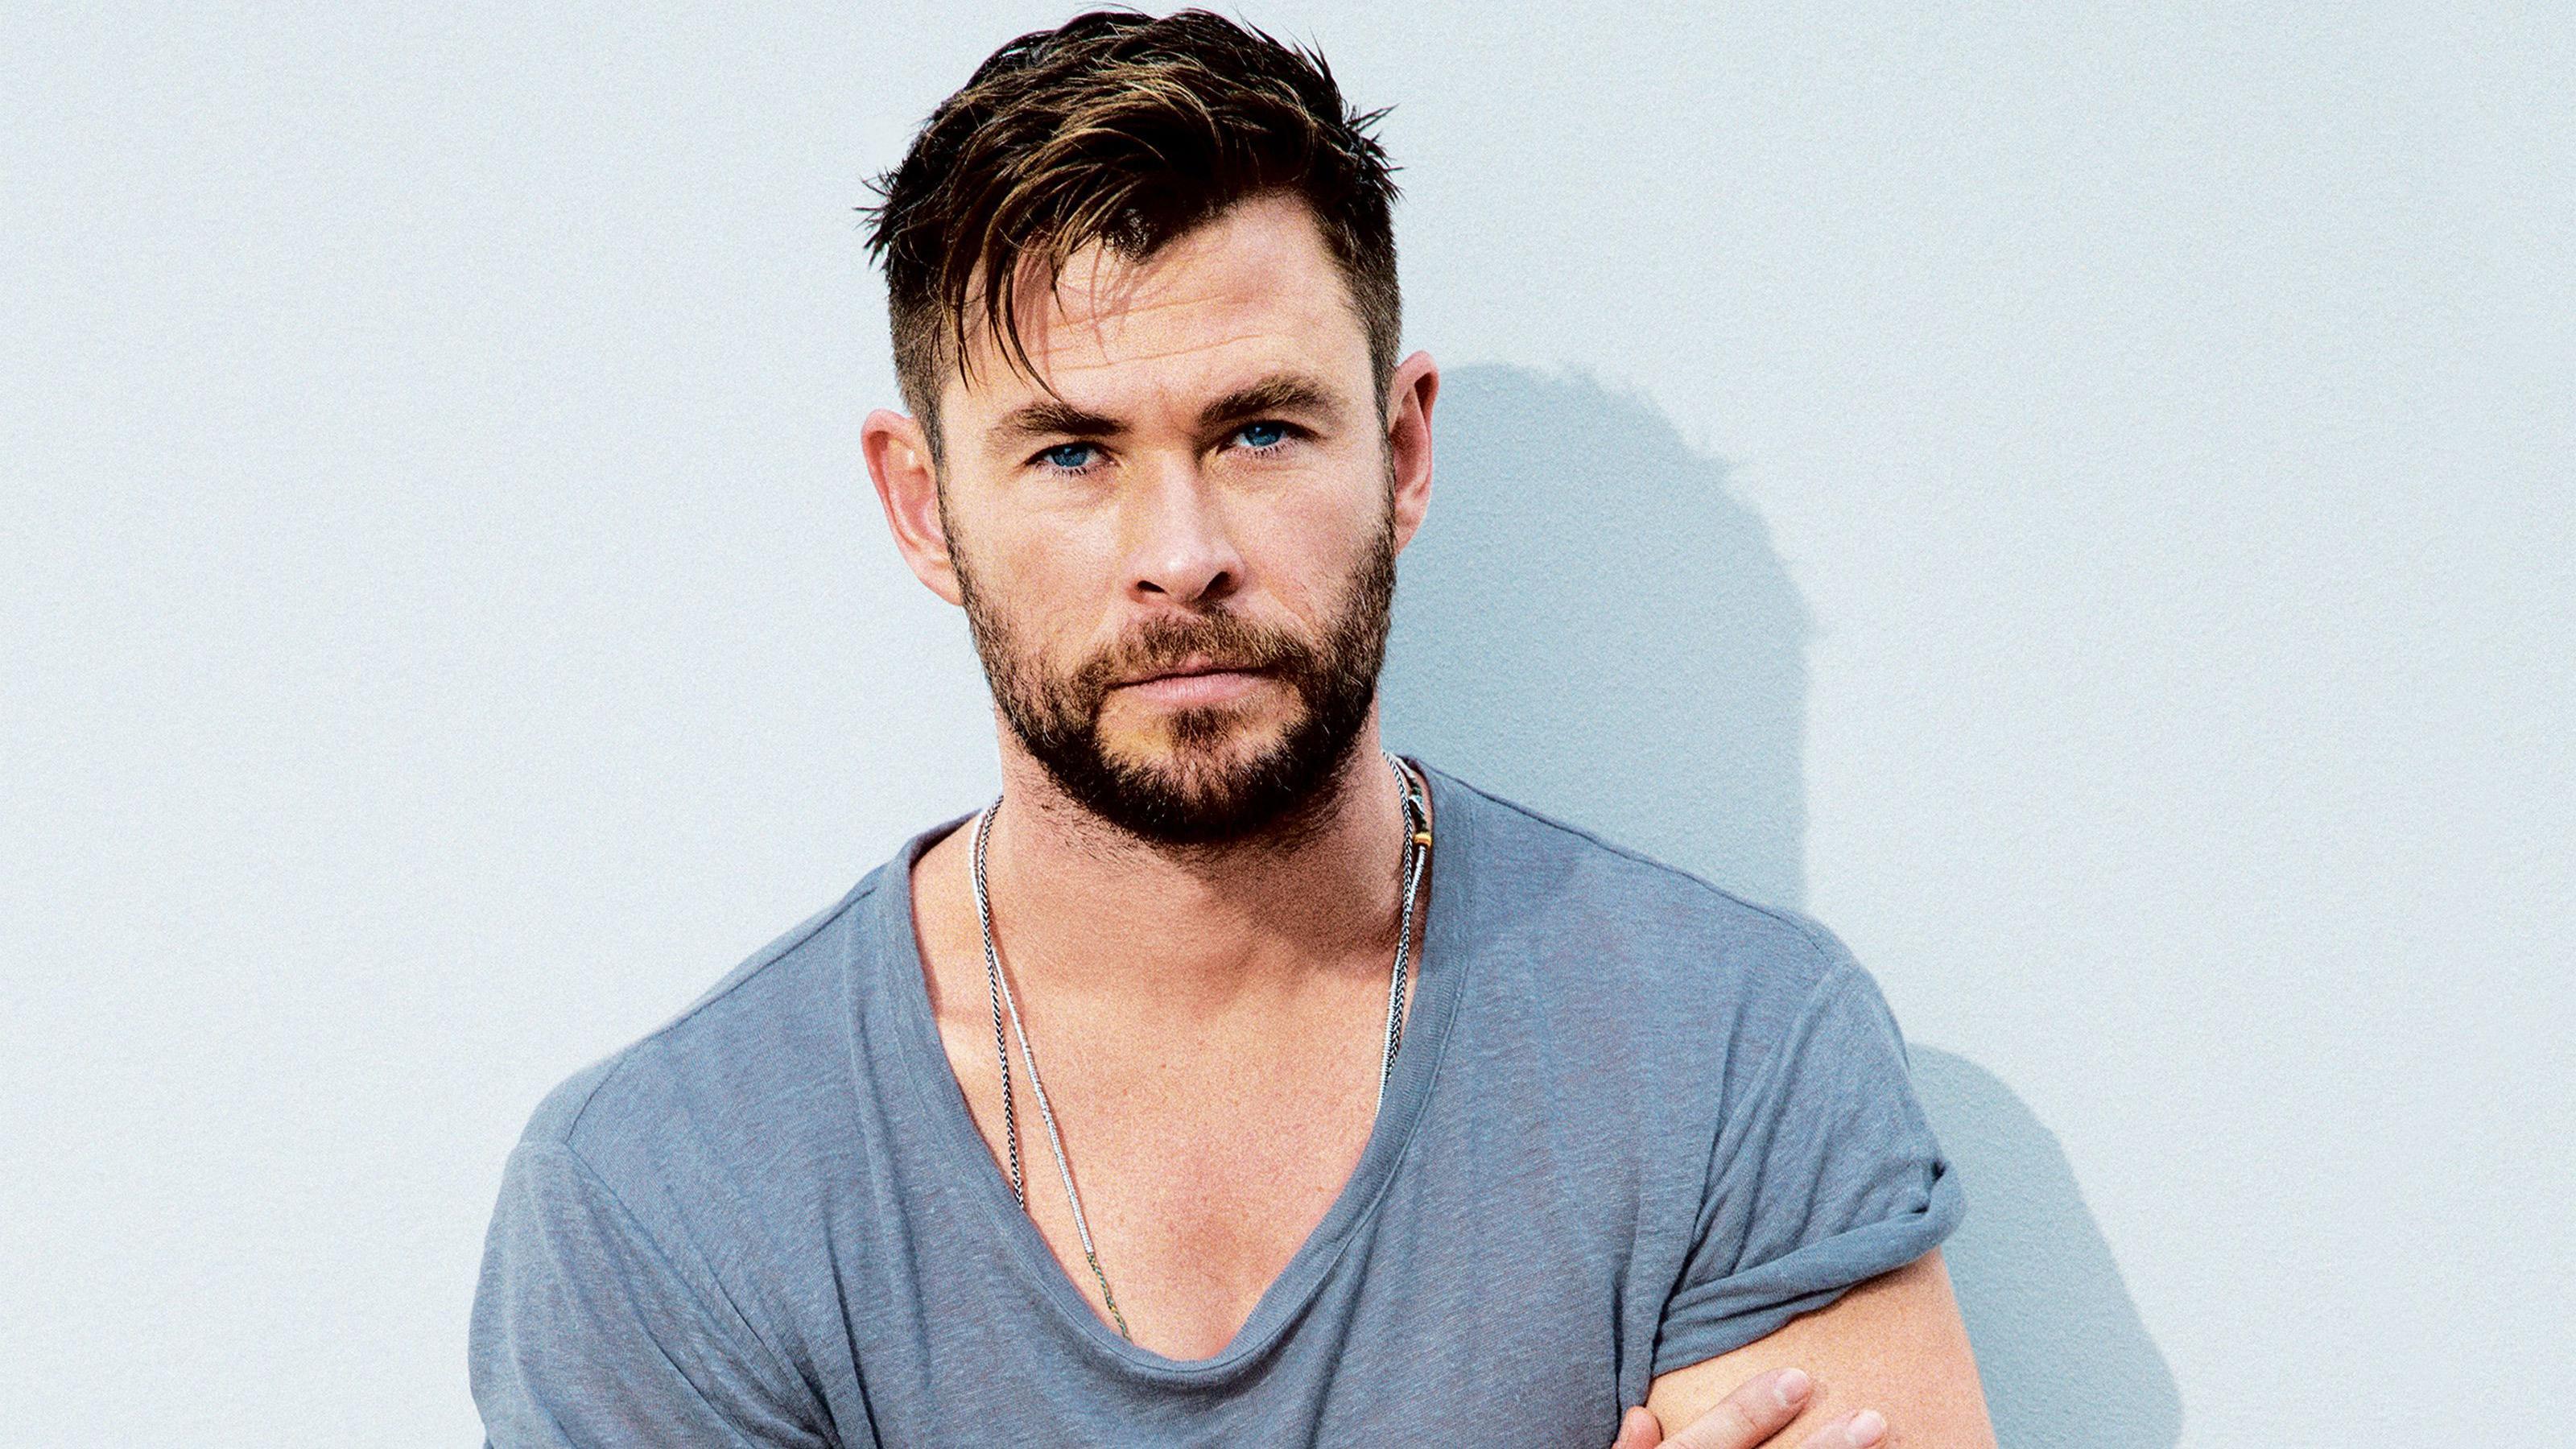 Chris Hemsworth 2019 Wallpapers Wallpaper Cave